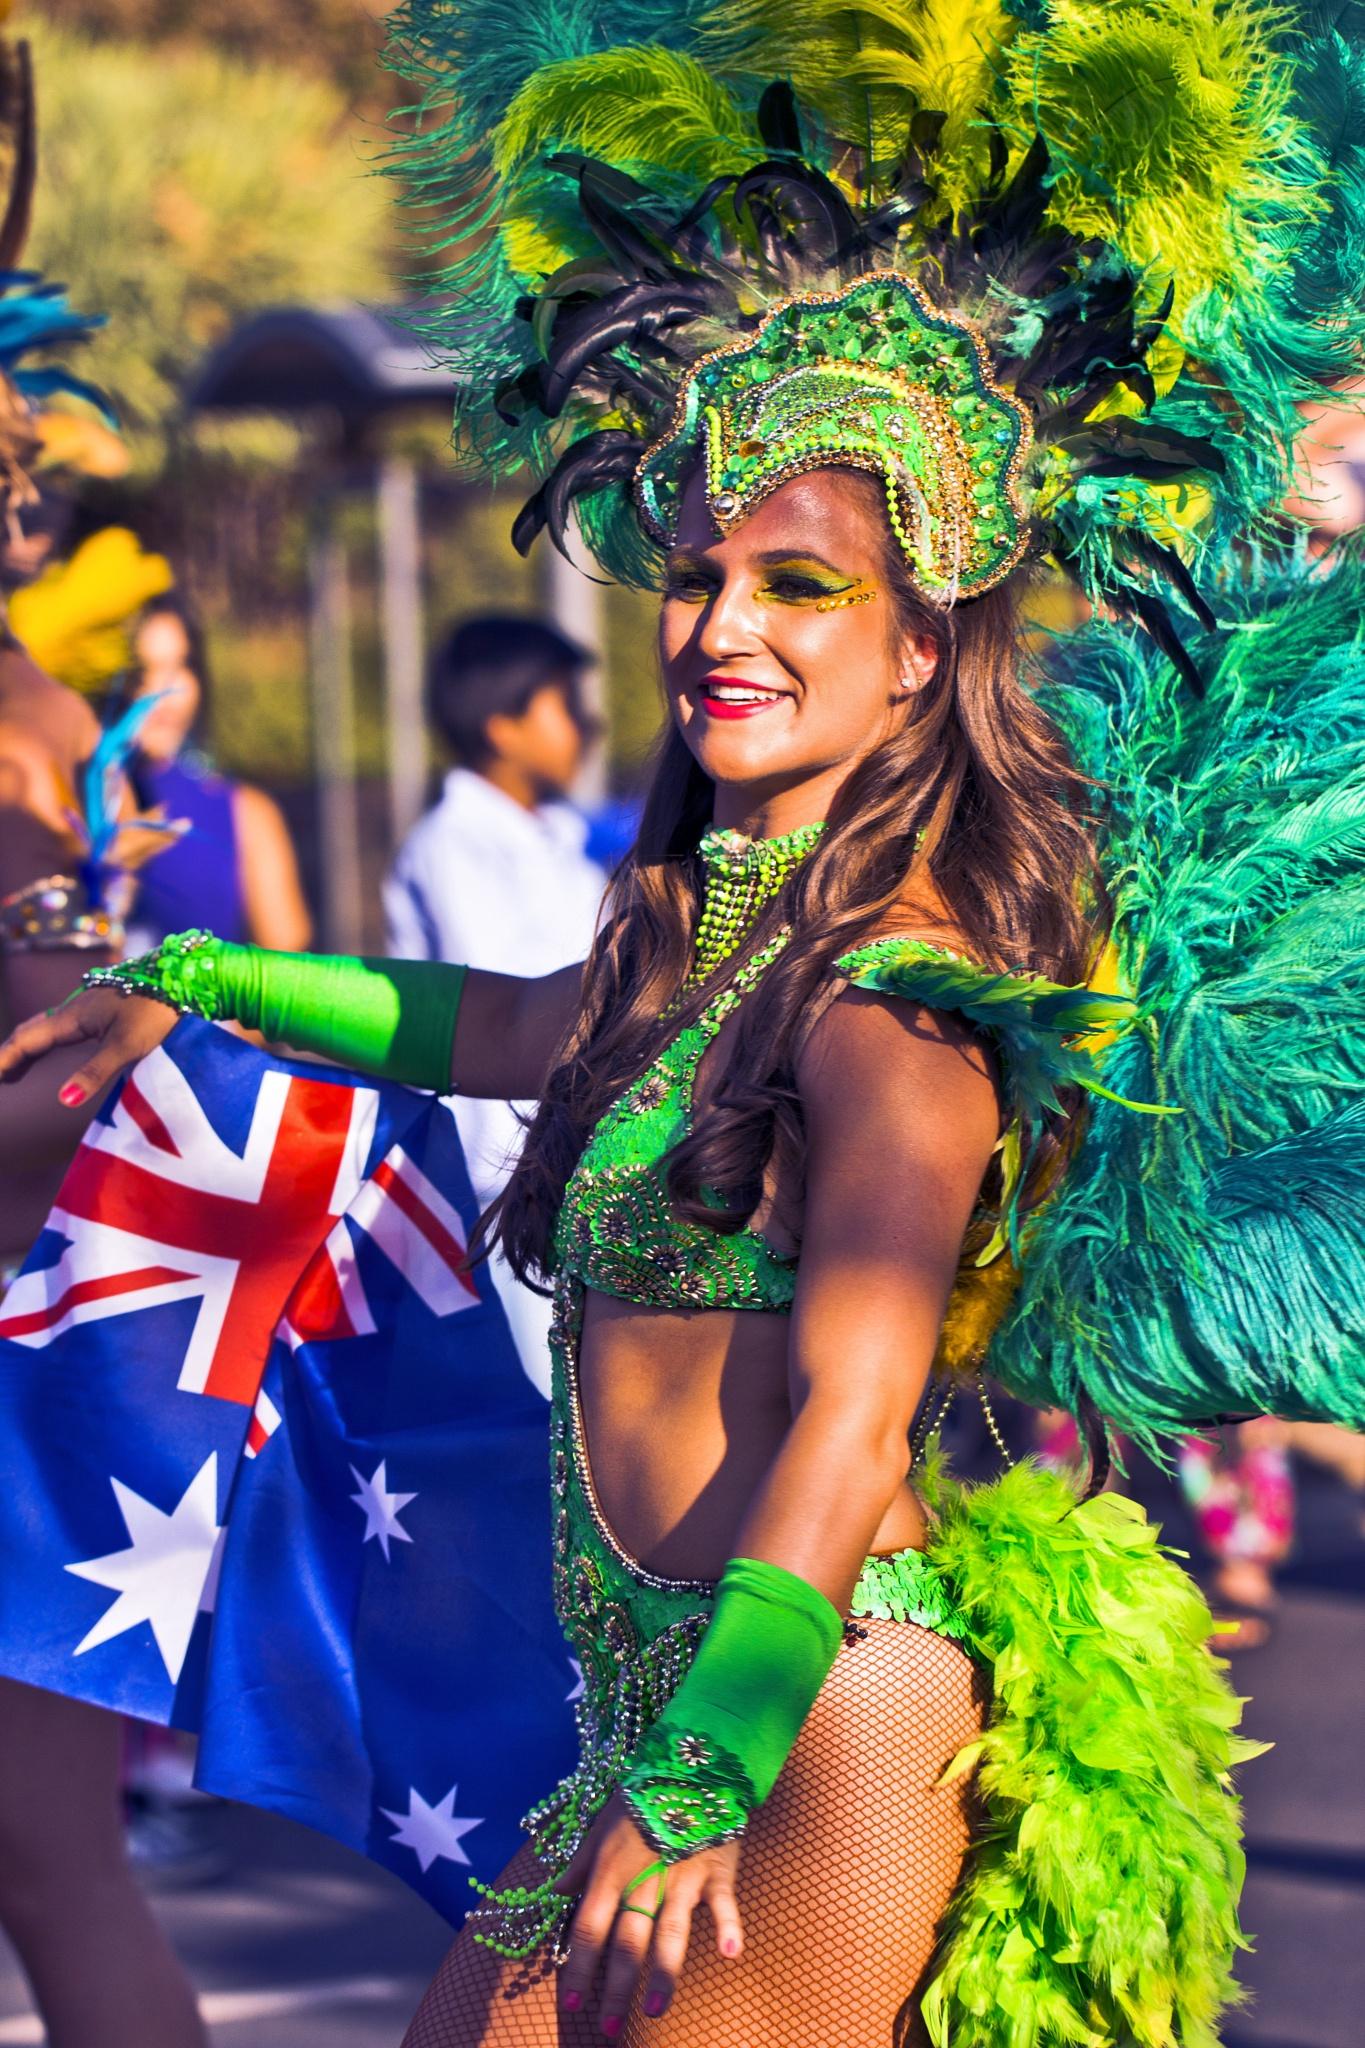 Australia Day Parade, Brazilian Dancer by Ersu Turk